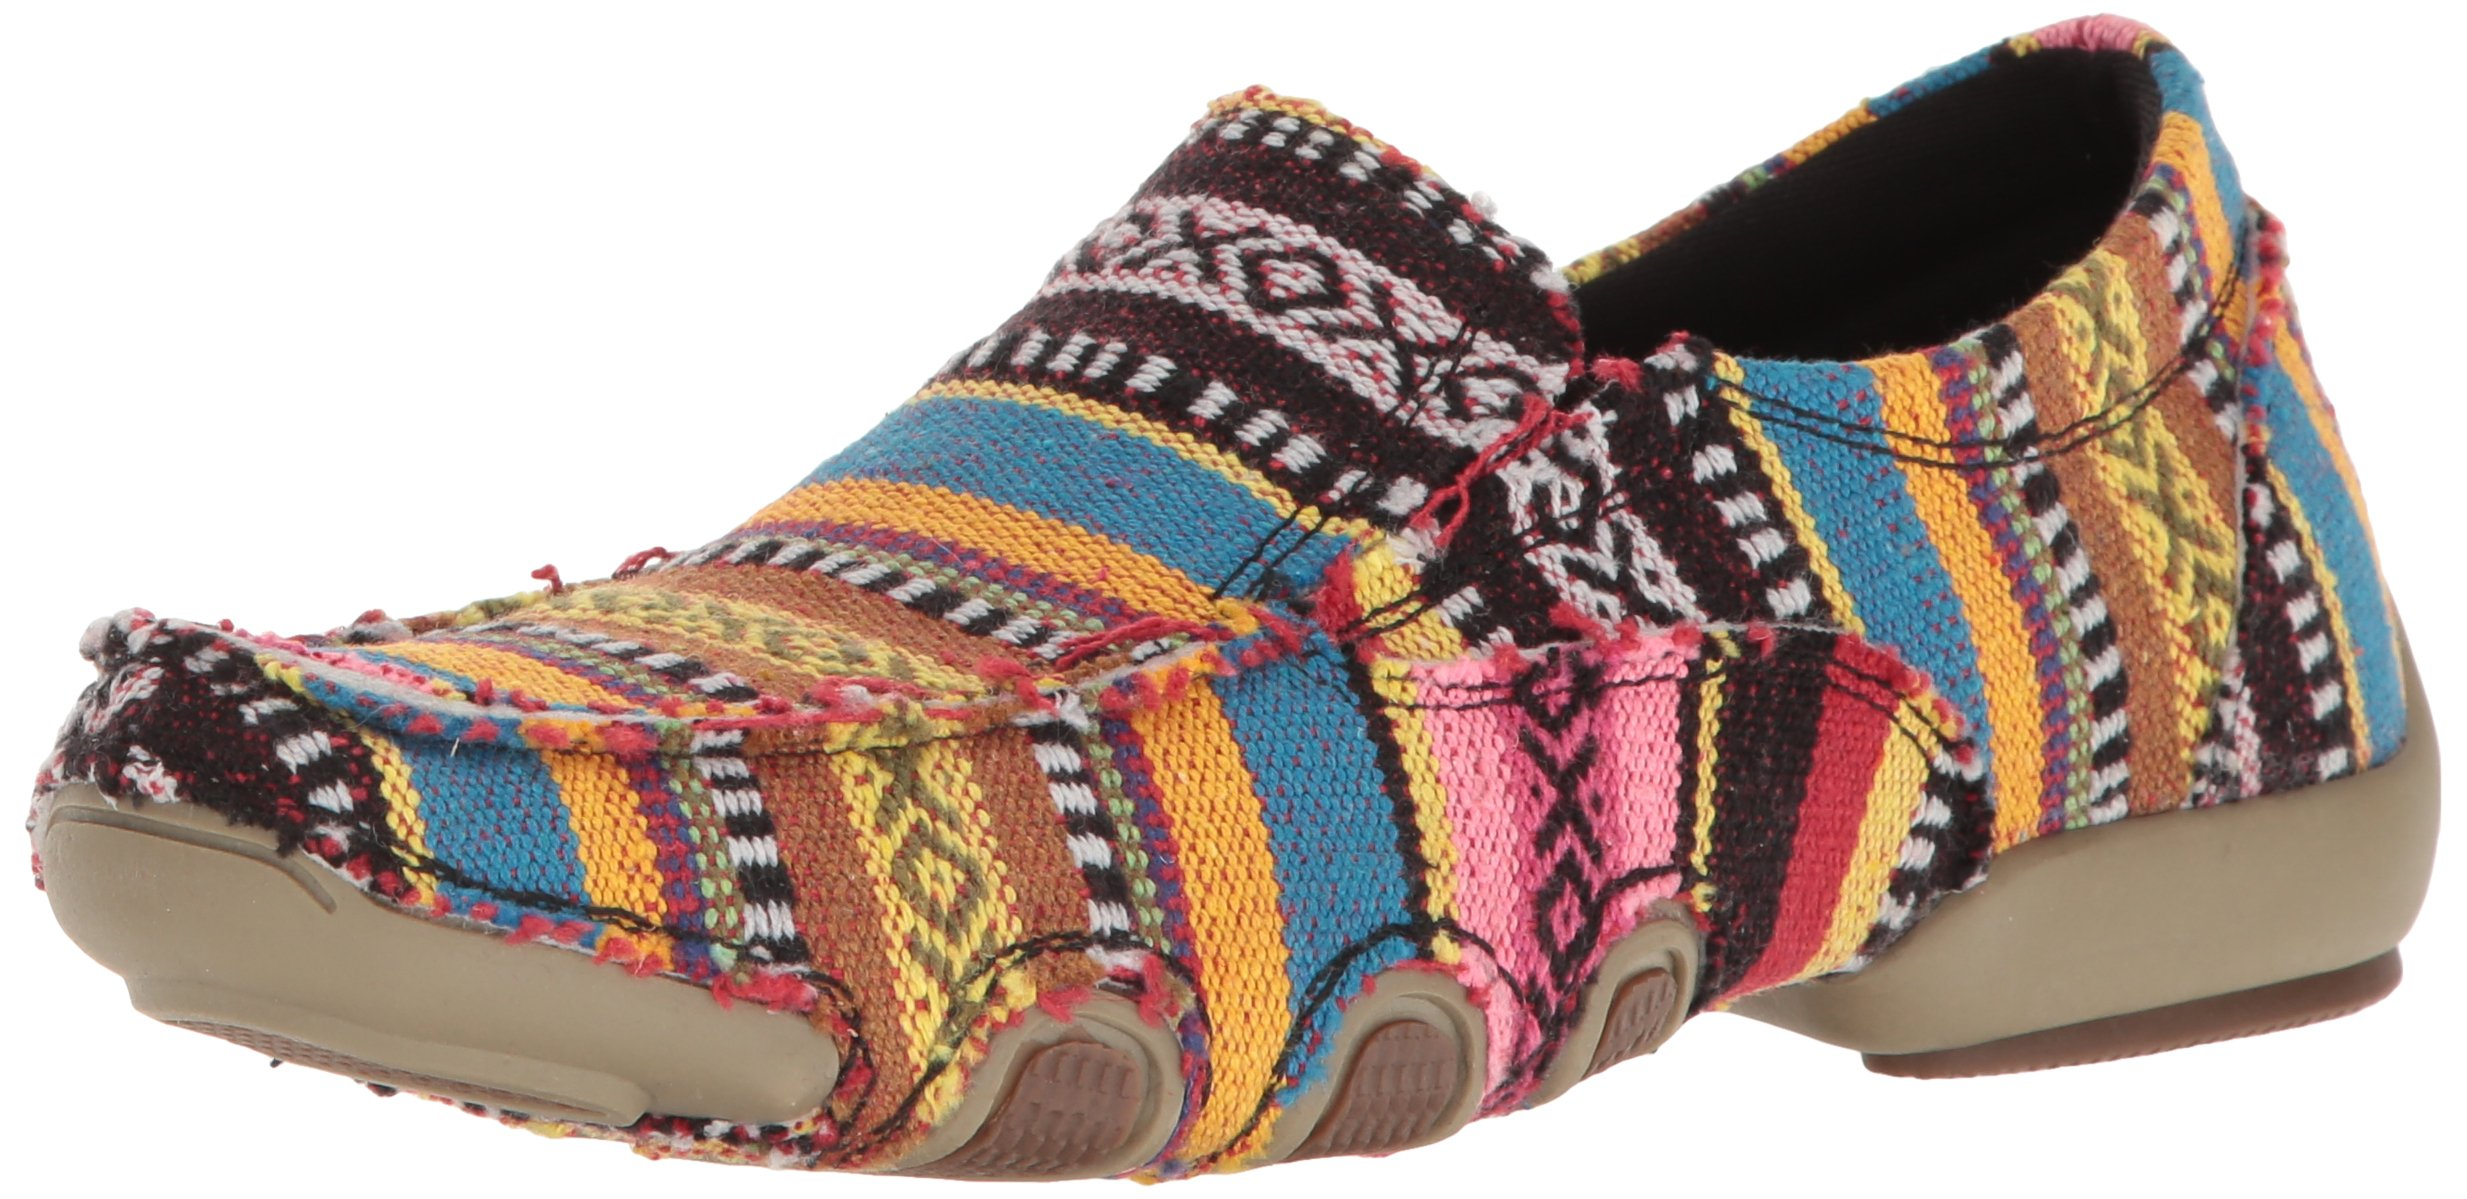 Roper Women's Liza Driving Style Loafer, Multi, 9 Medium US